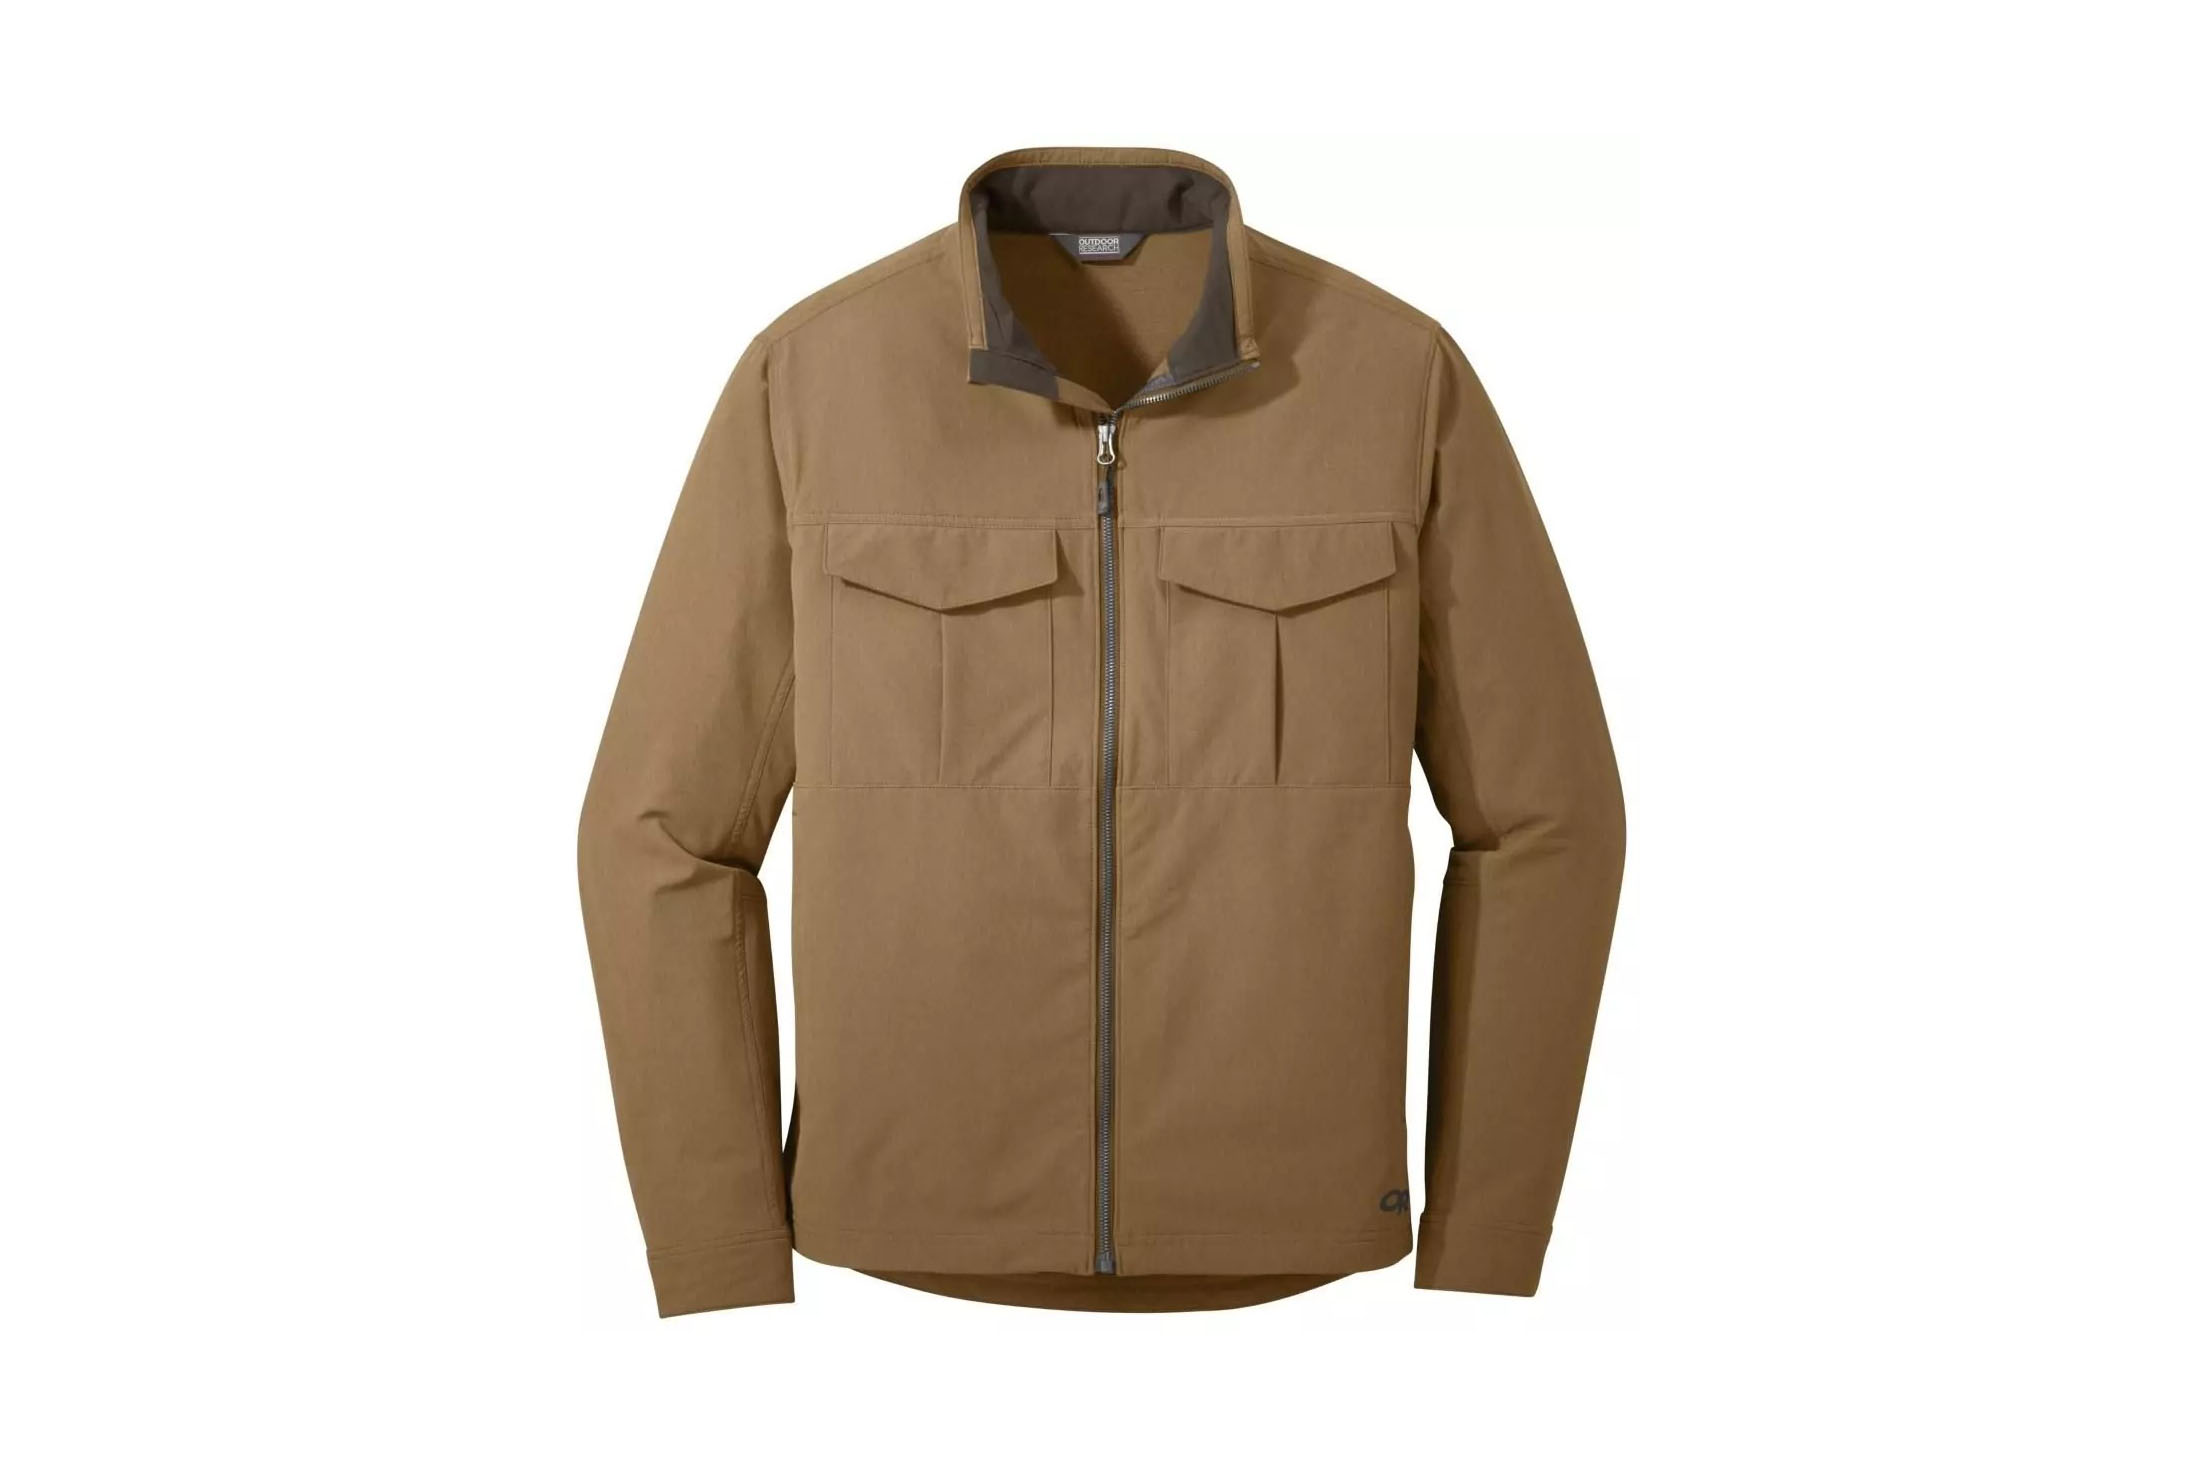 Tan jacket on white background